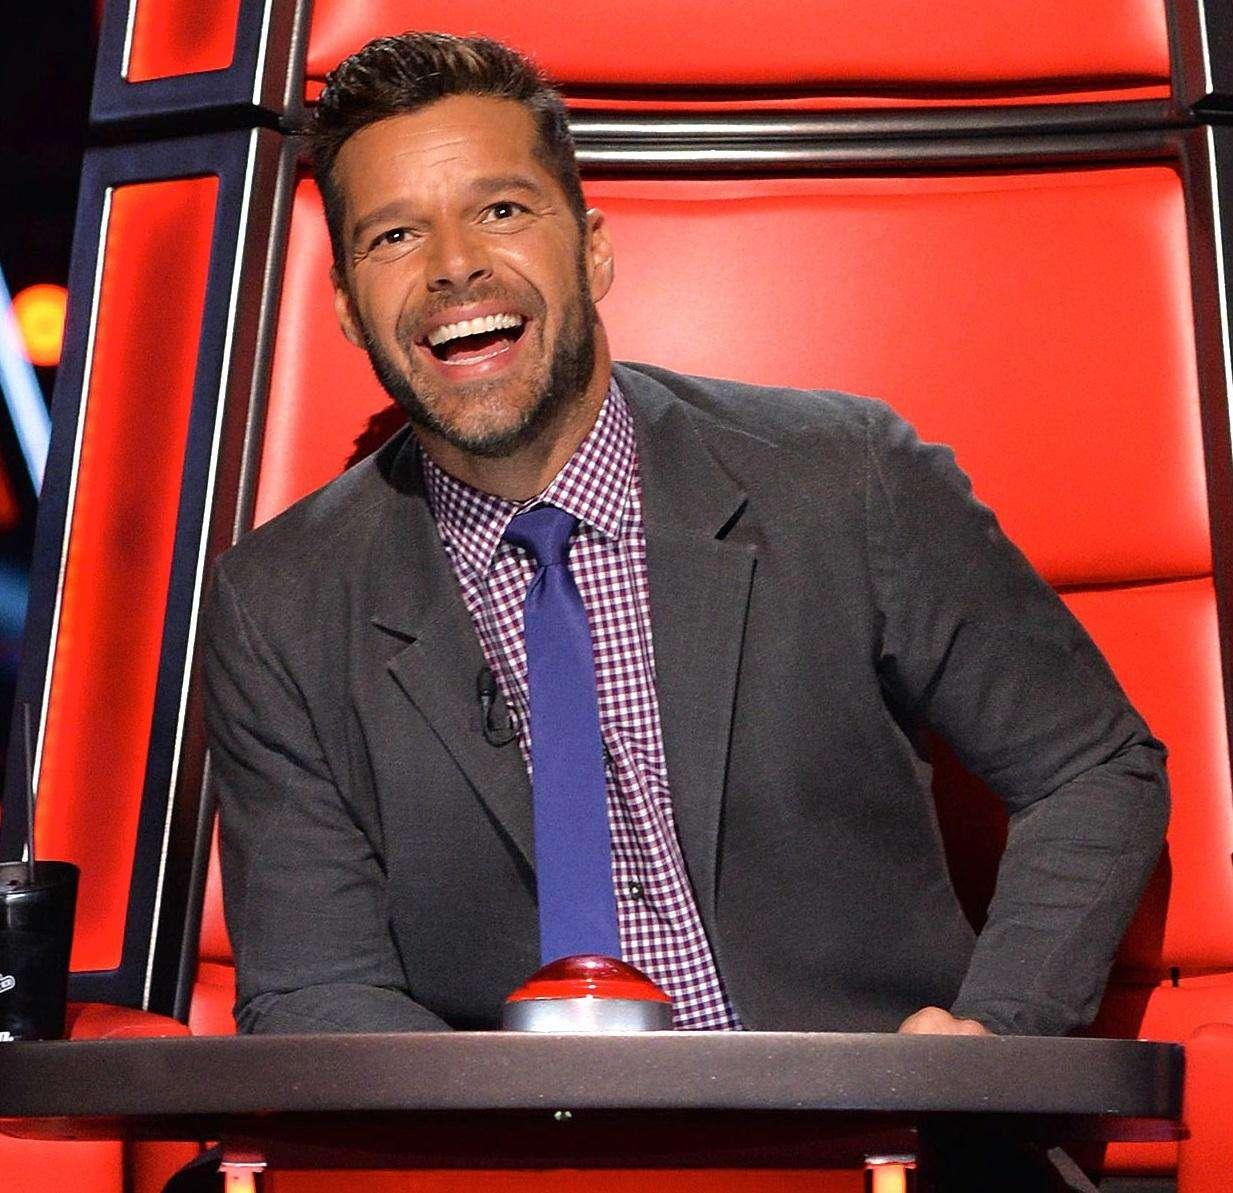 ¿Que Ricky Martin anda con Ian Thorpe? Foto: Agencia Mezcalent